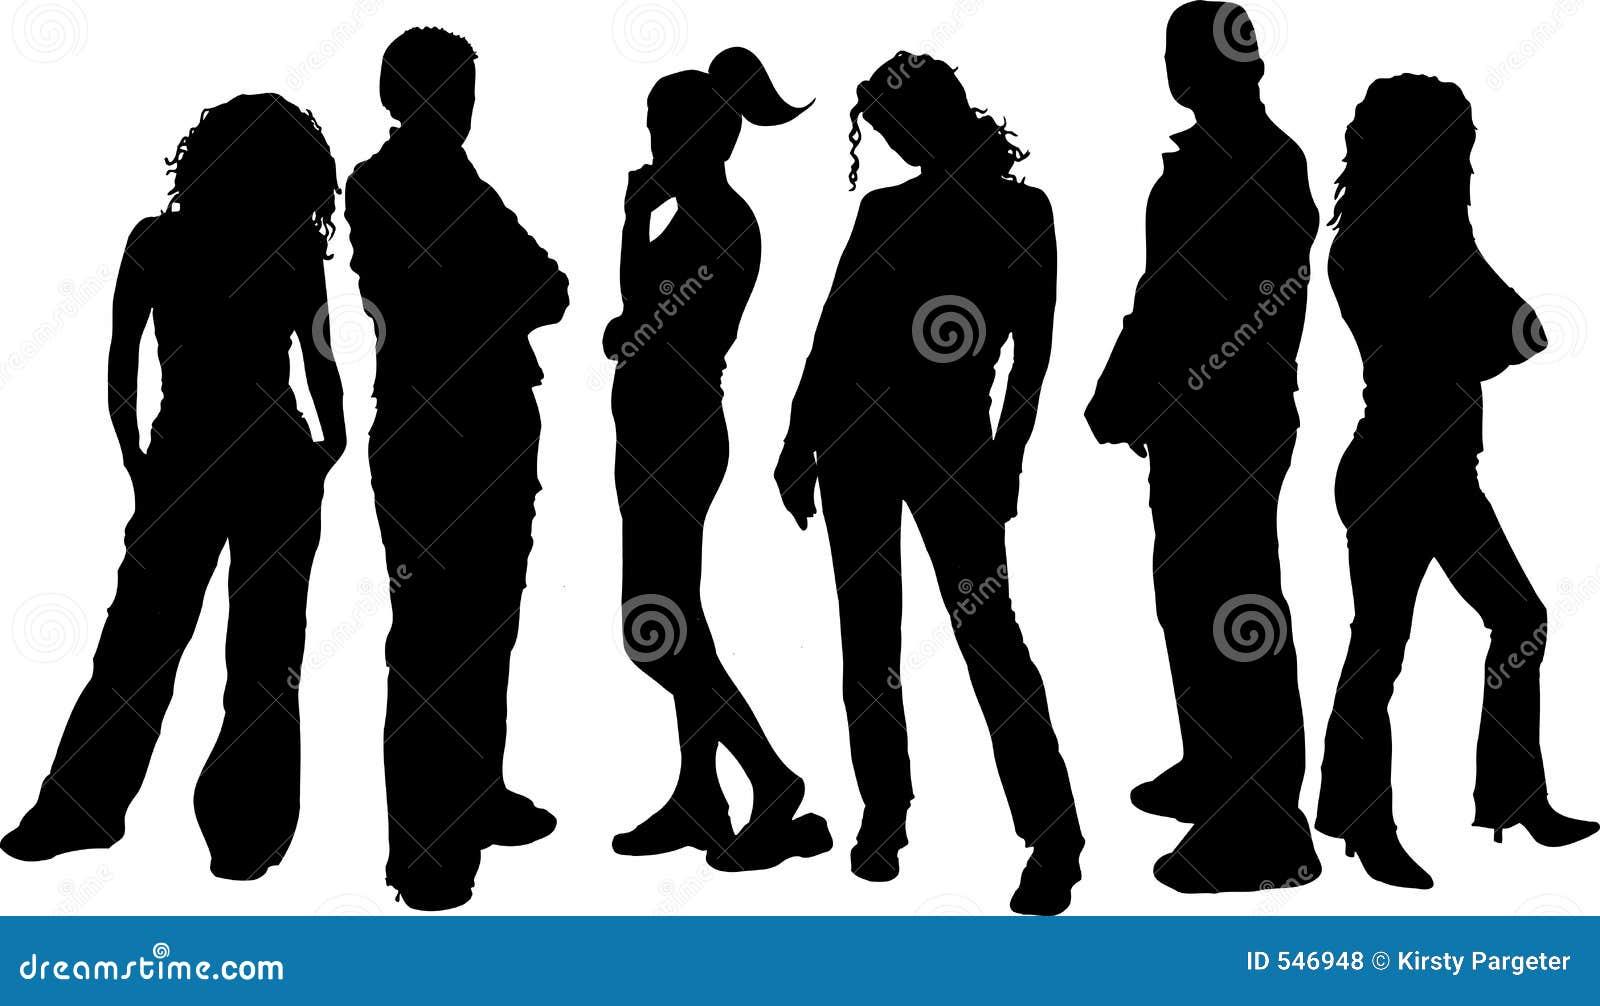 Download 朋友 向量例证. 插画 包括有 向量, 妇女, 人群, 女性, 图象, 女孩, 剪影, 艺术, 人们, 男朋友 - 546948